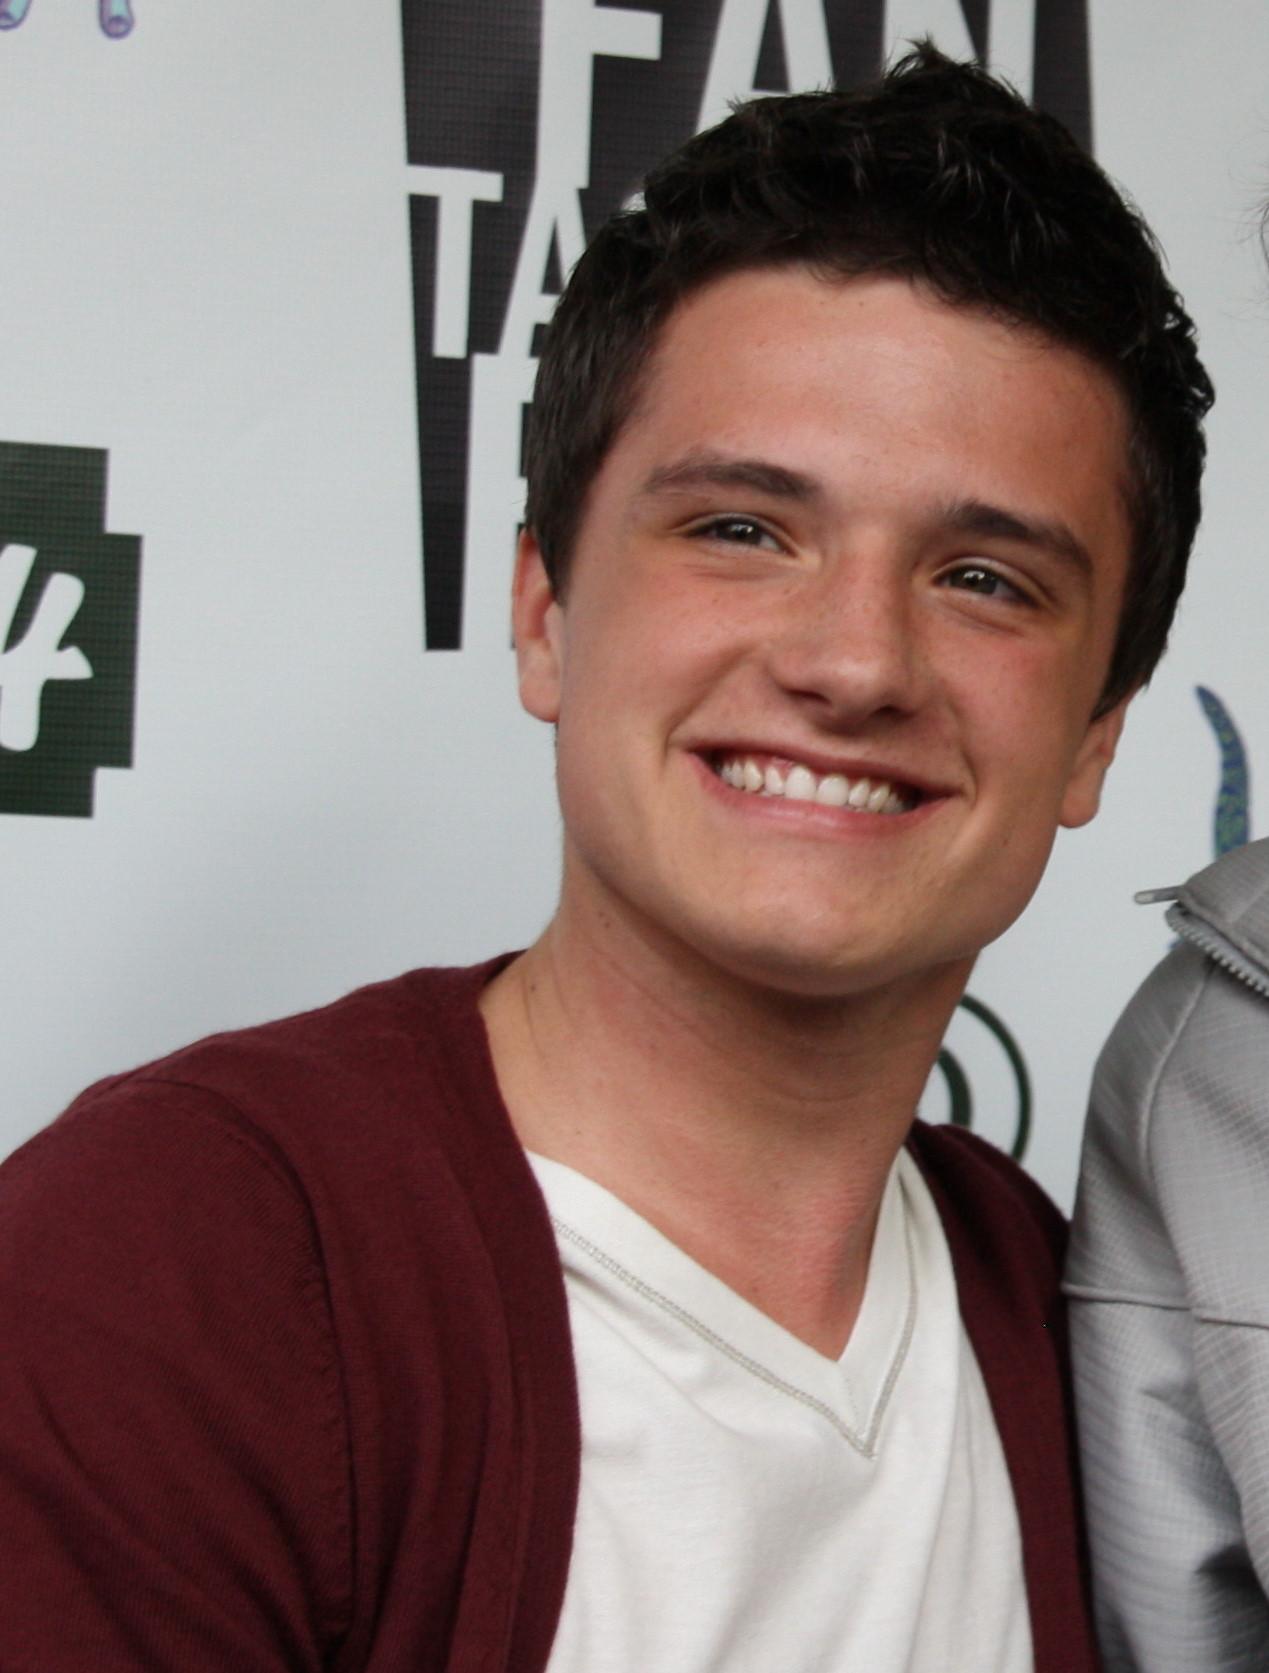 Josh Hutcherson smilin...